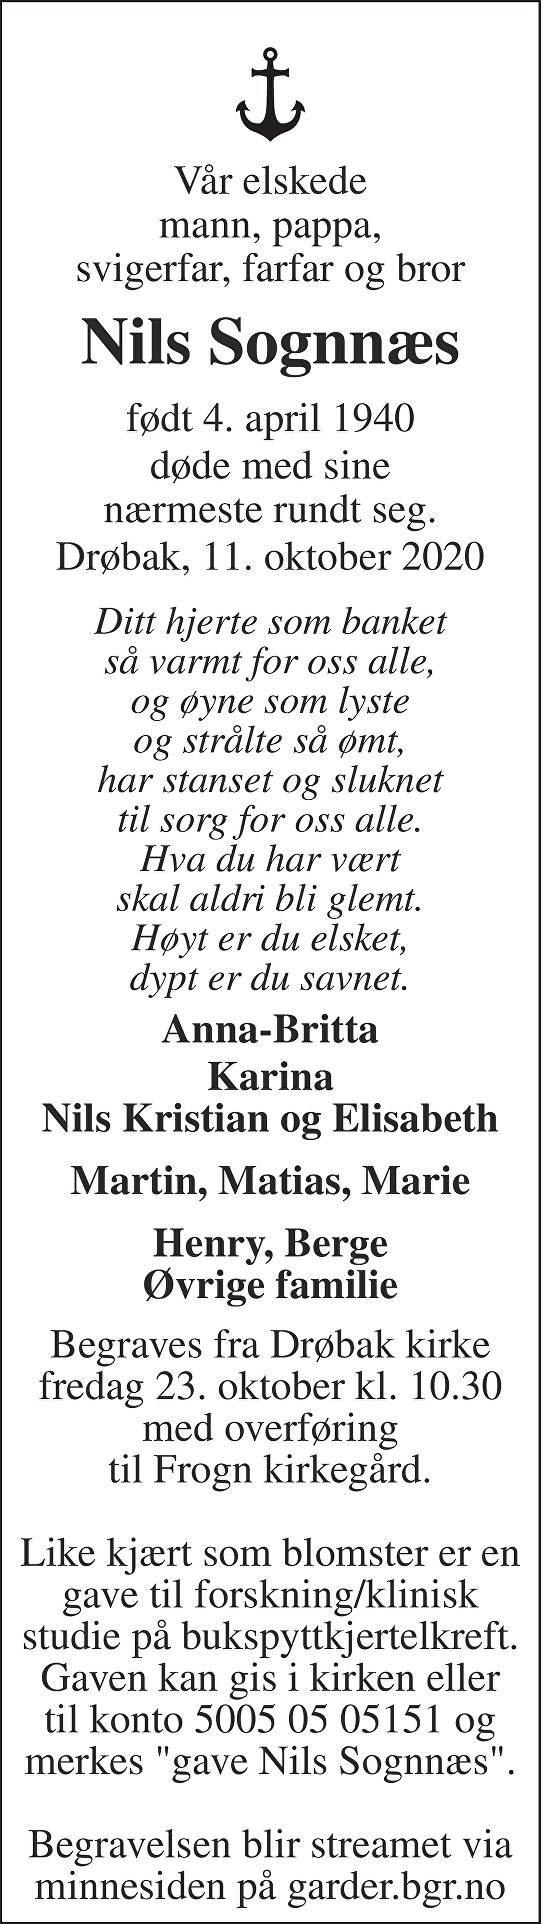 Nils Sognnæs Dødsannonse